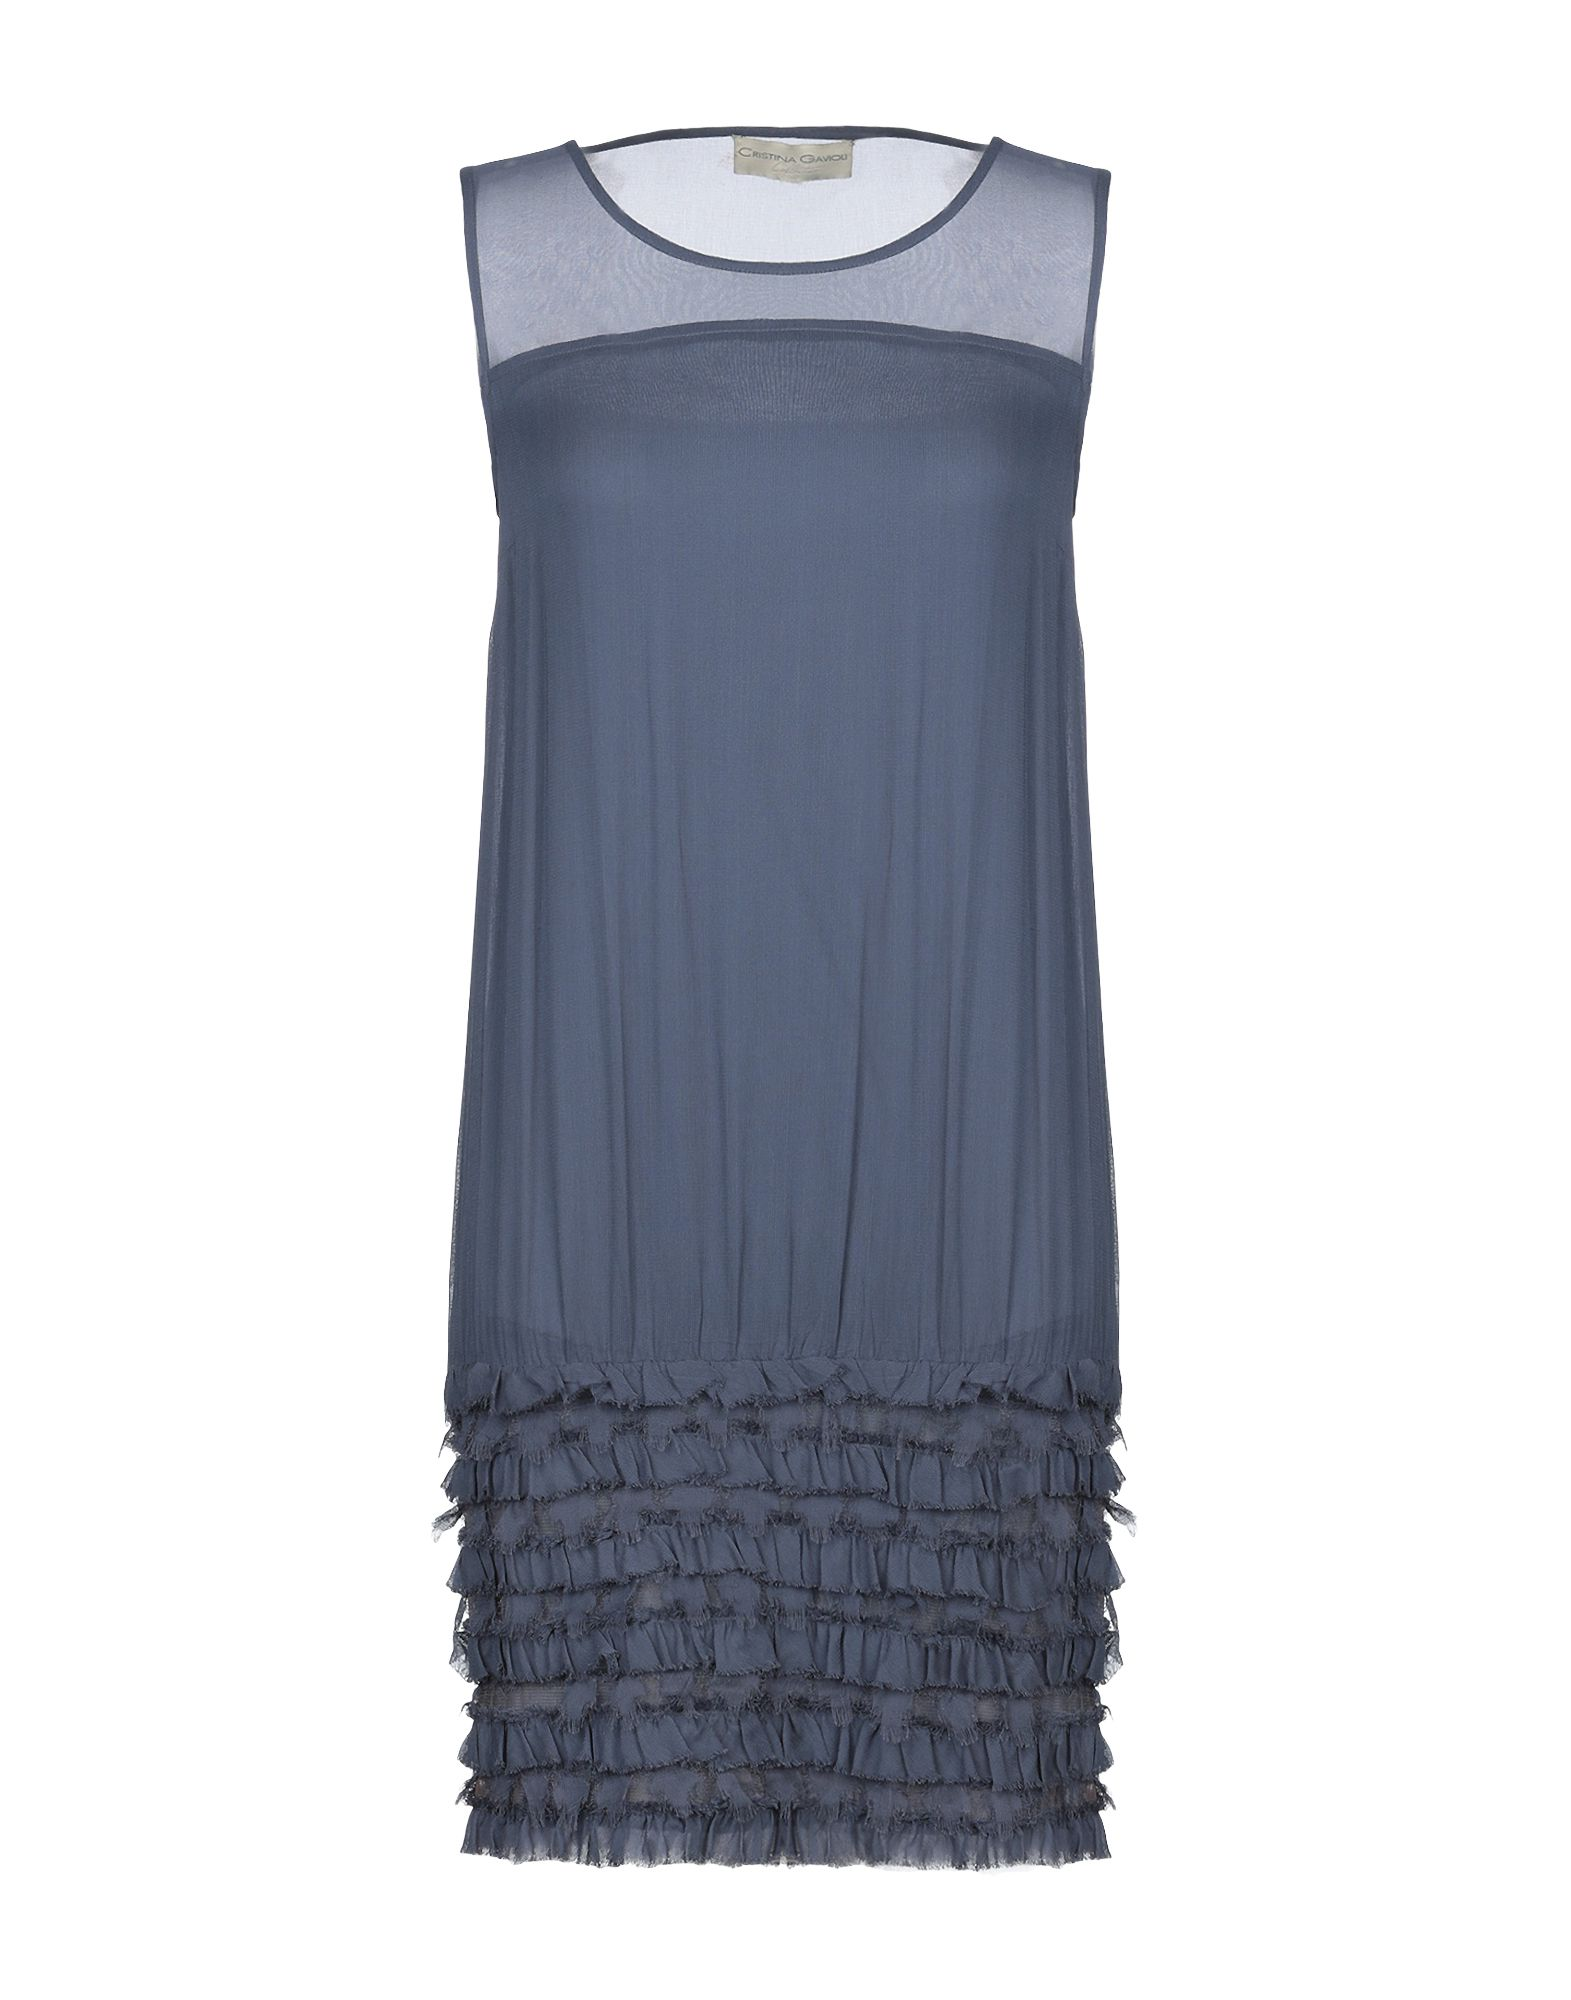 CRISTINA GAVIOLI COLLECTION Короткое платье болеро cristina gavioli collection болероhref